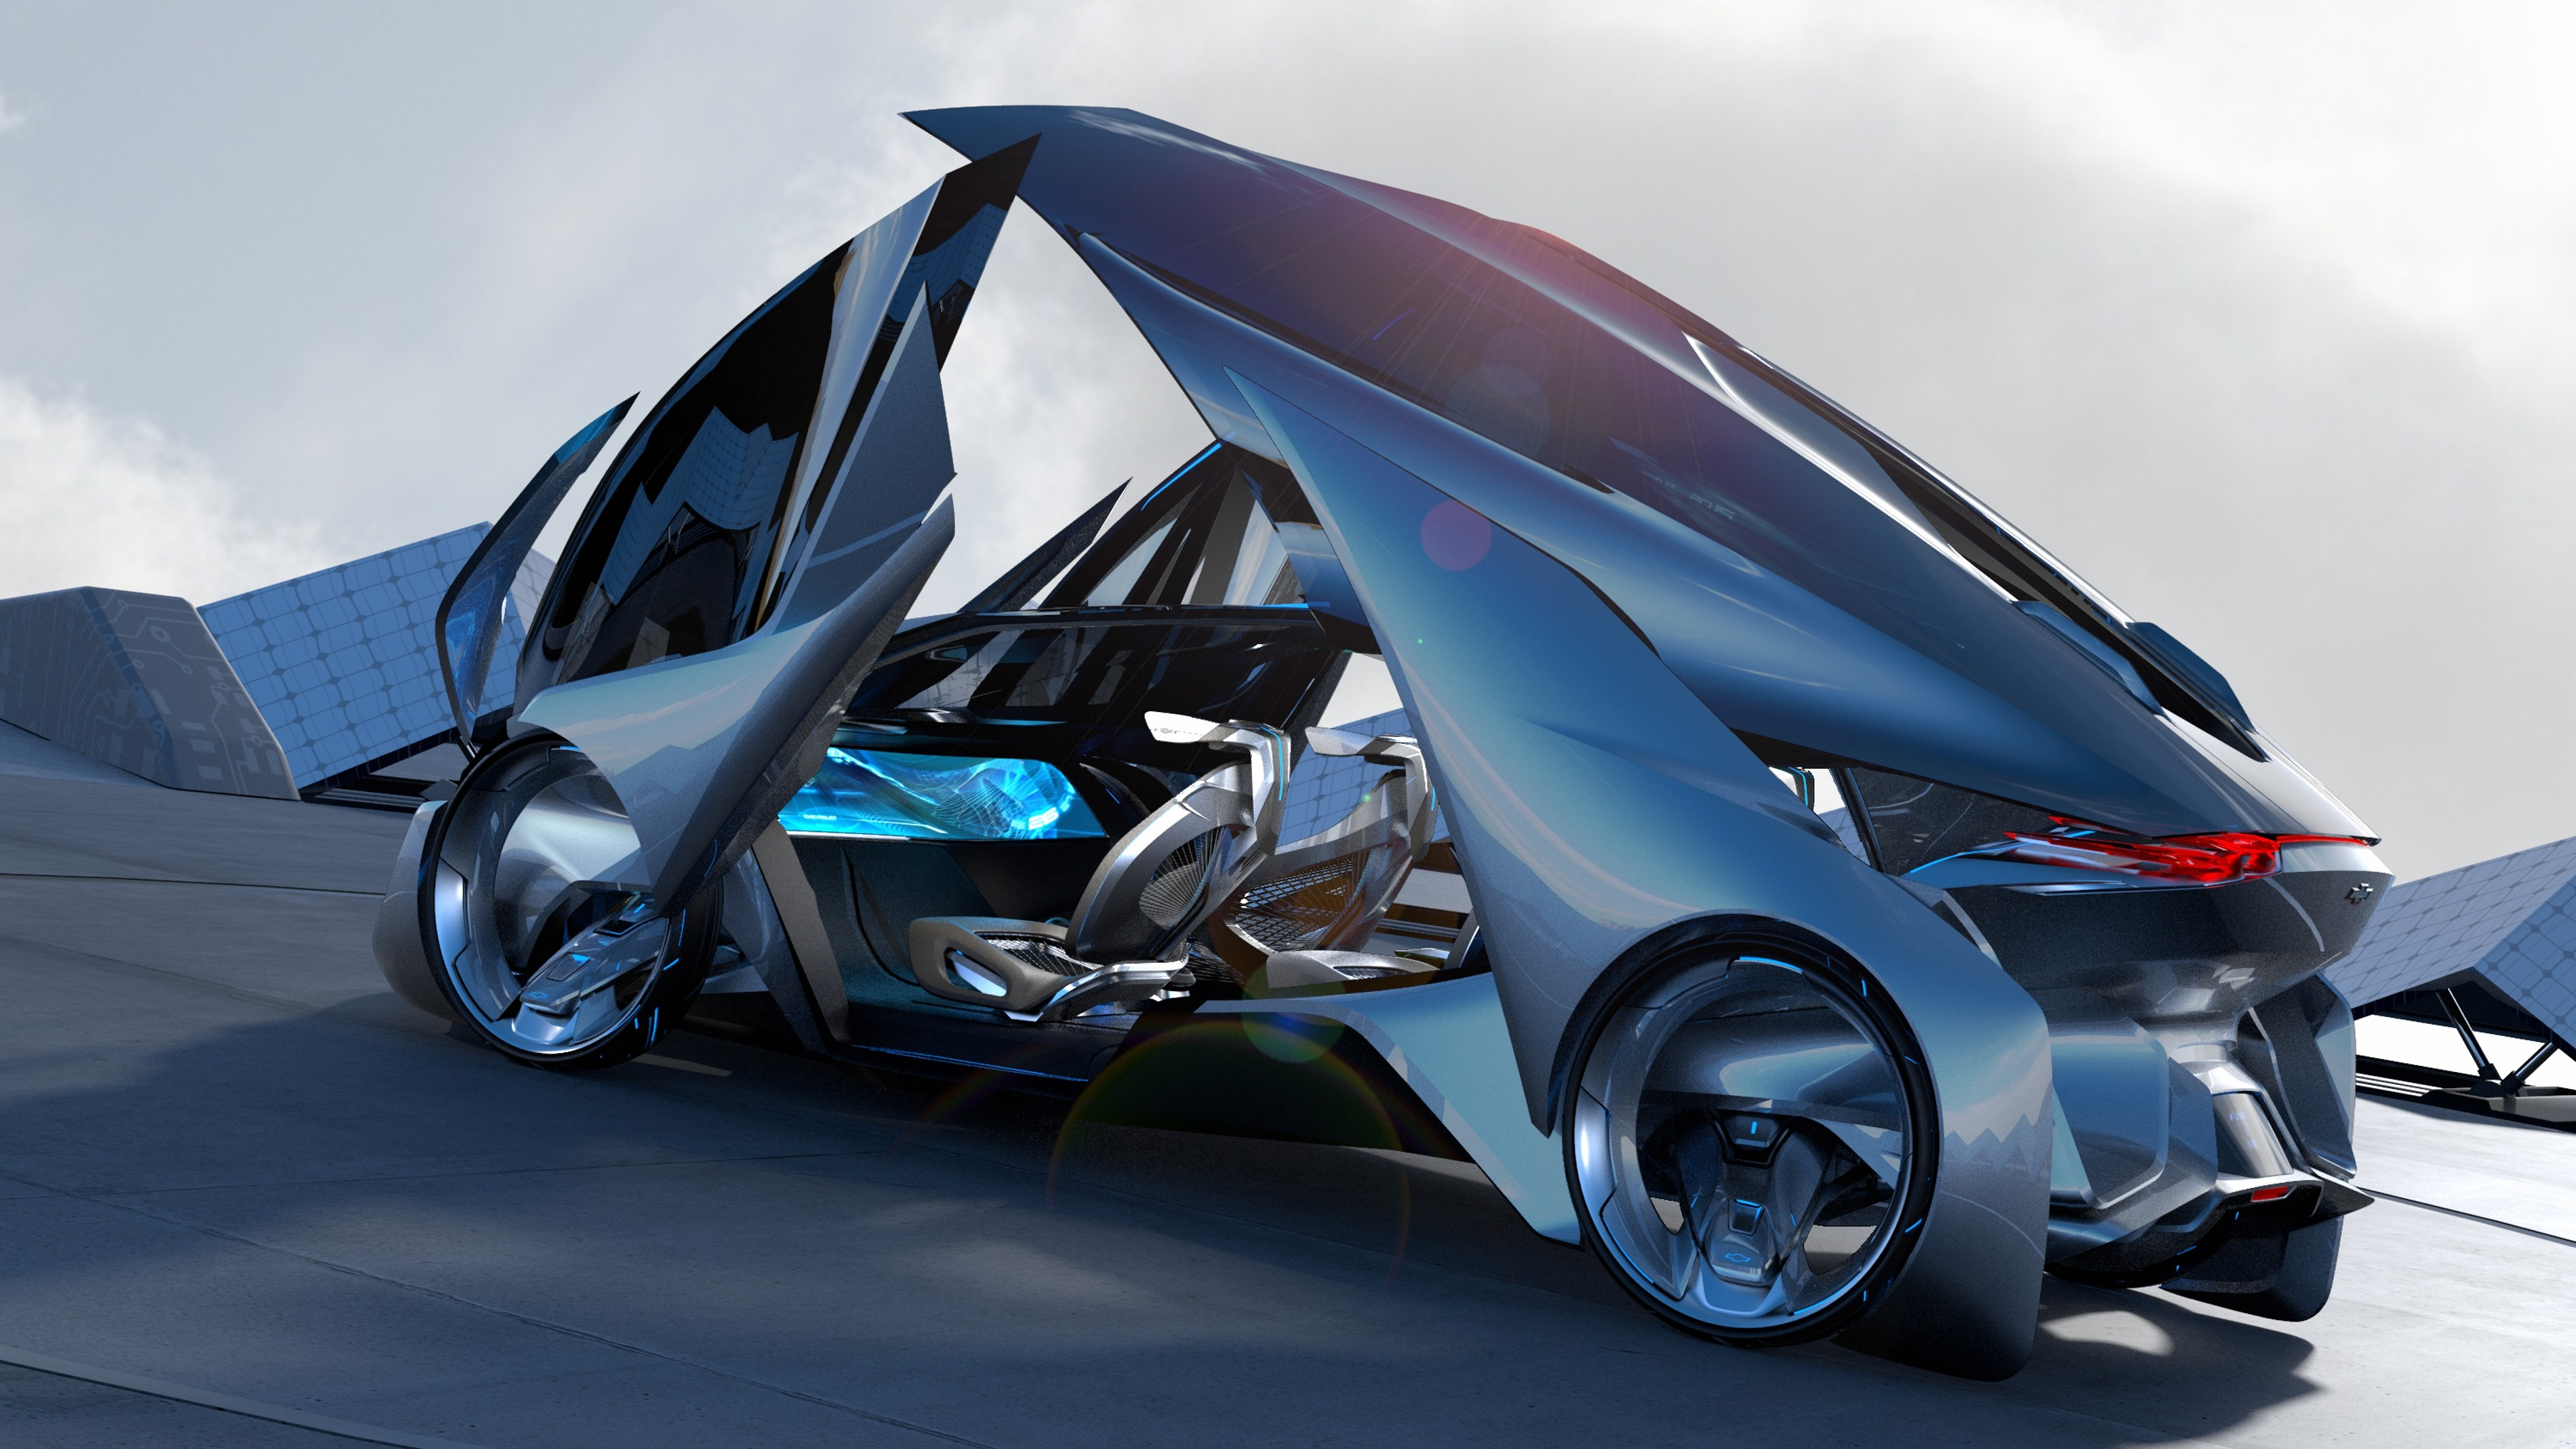 chevrolet fnr concept chevrolet sports car frankfurt 2015 future cars - Sports Cars Of The Future